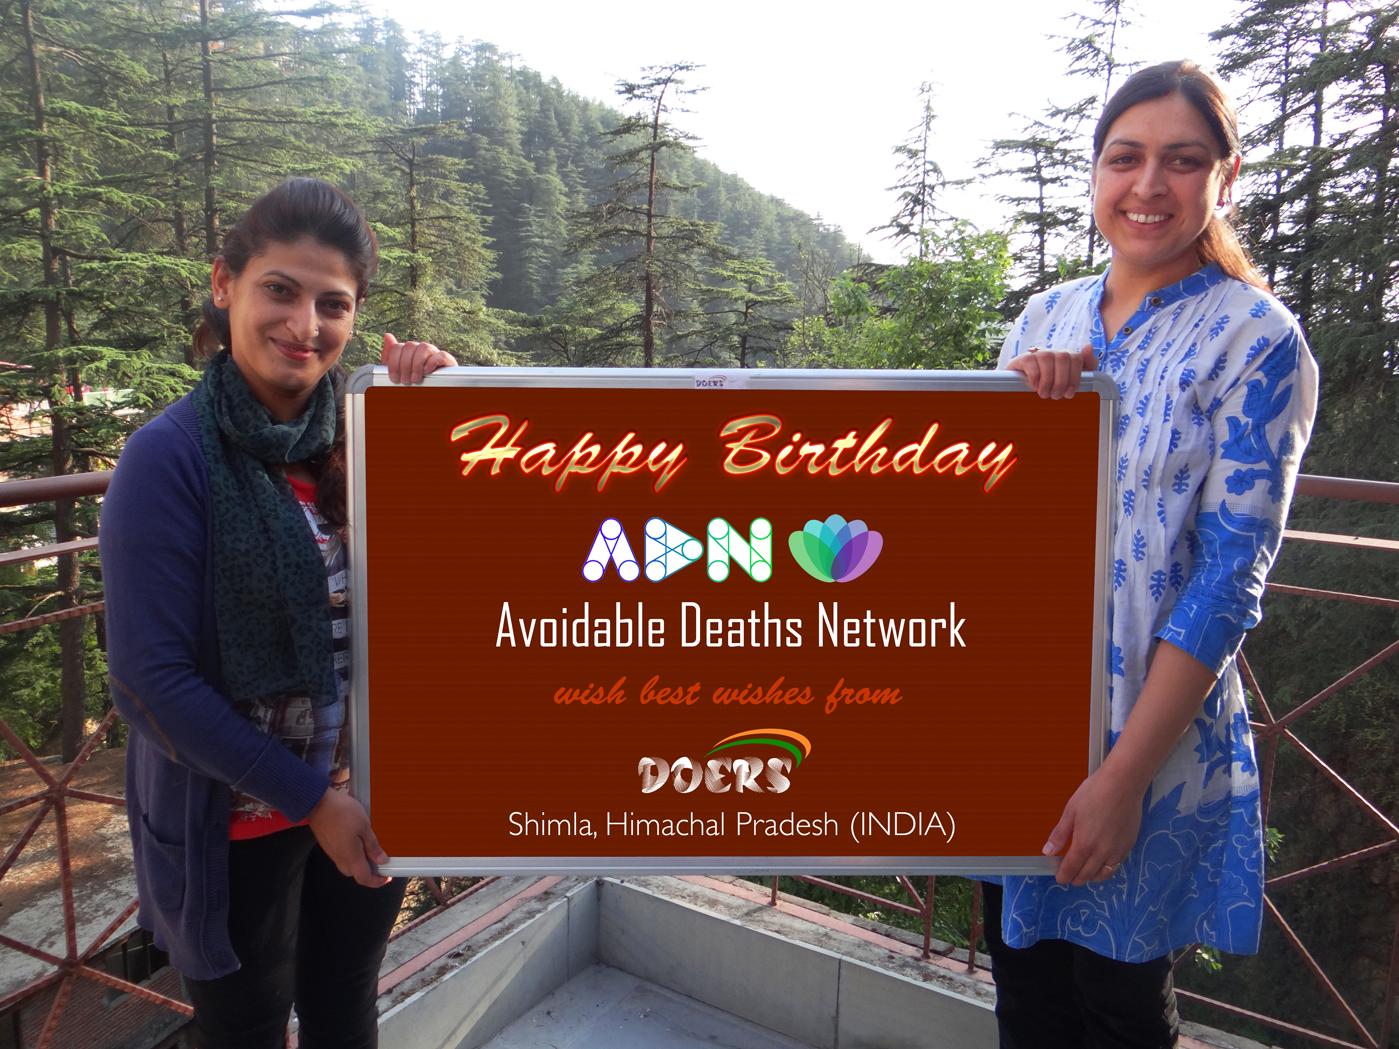 Birthday Wishes from Himachal Pradesh, India